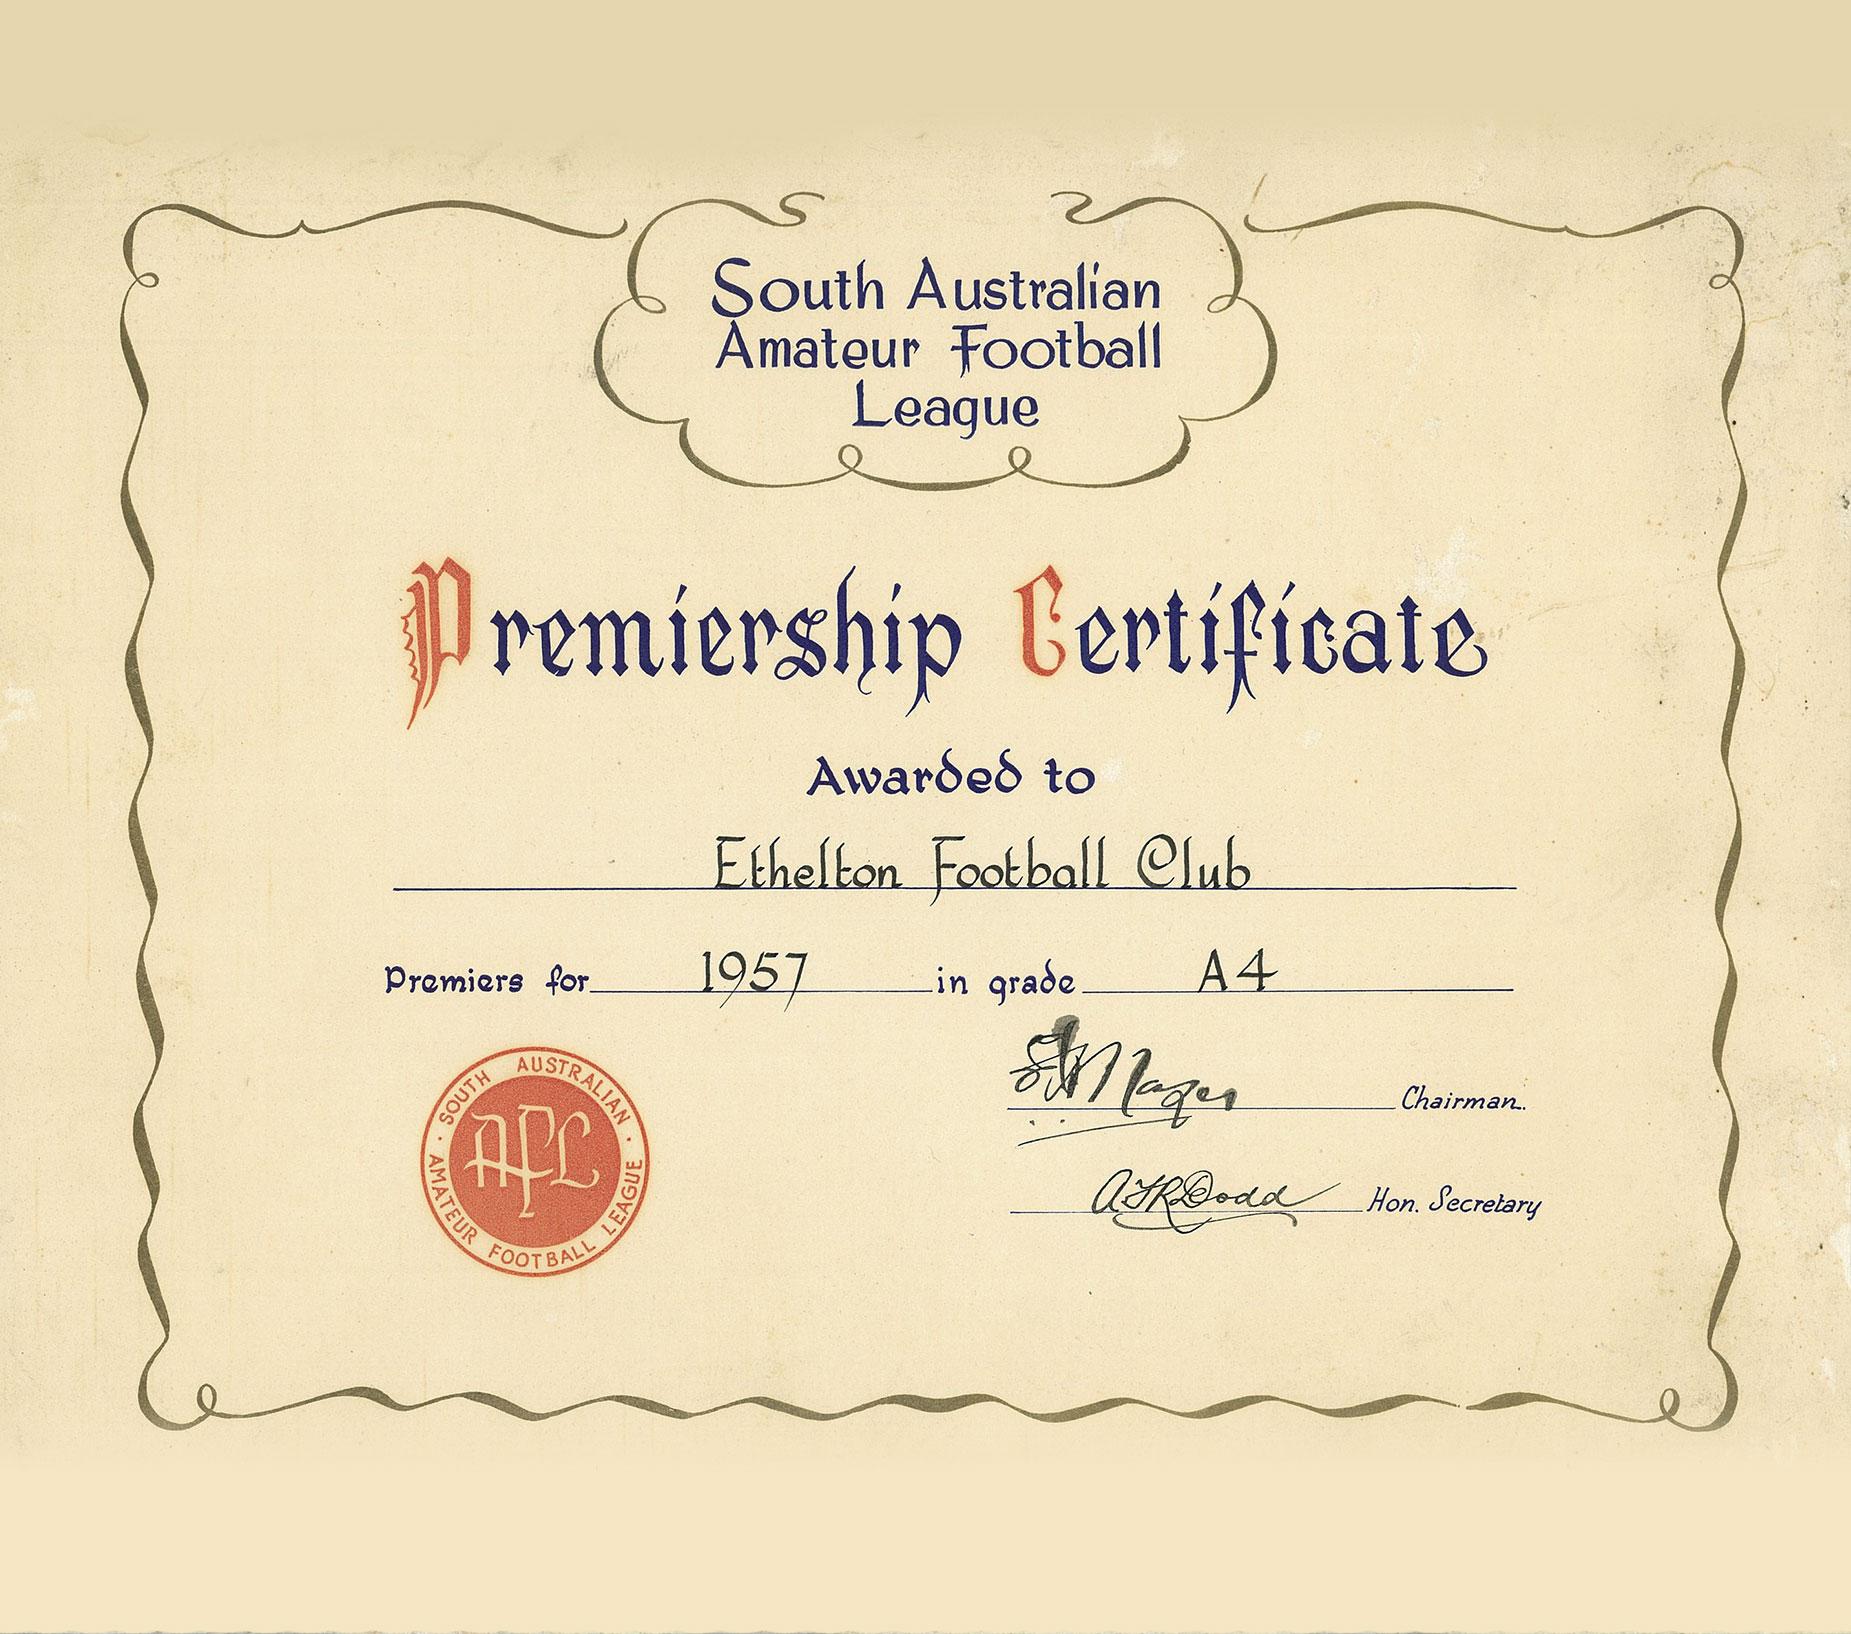 Ethelton Football Club